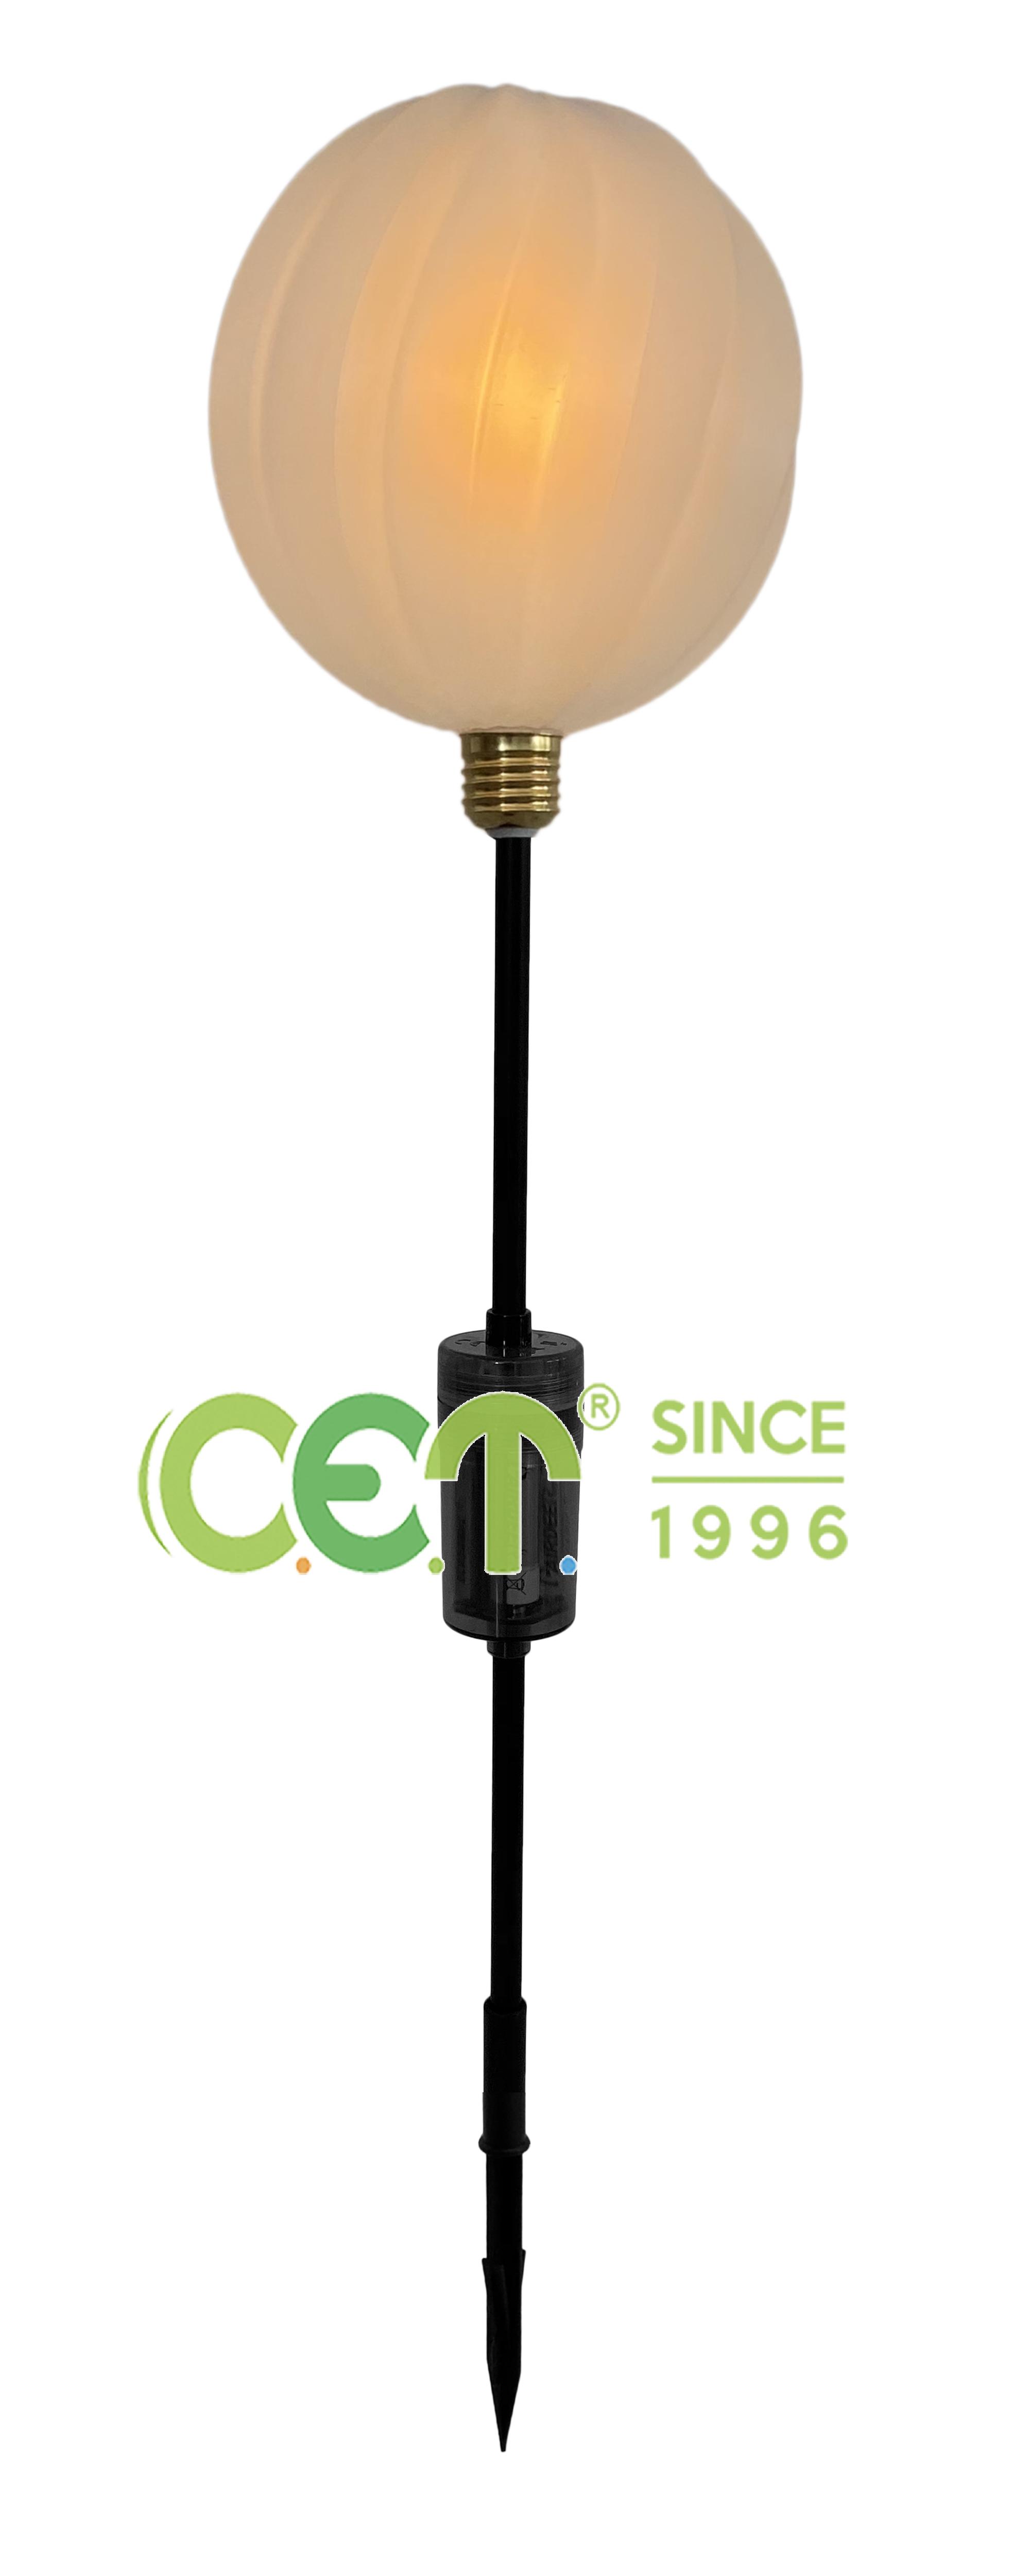 C.E.T Array image472